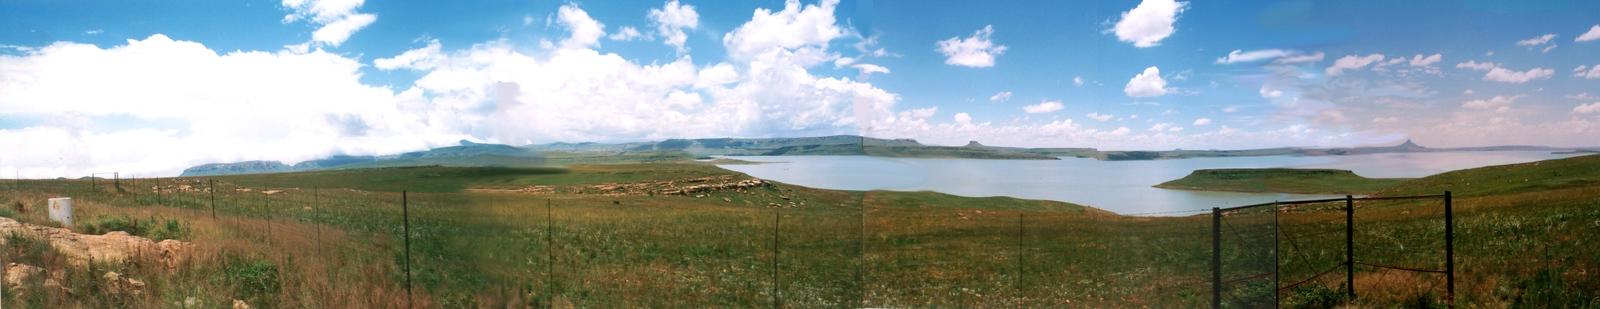 Hiking driving in the Drakensberg South Africa and  Bingelela B&B